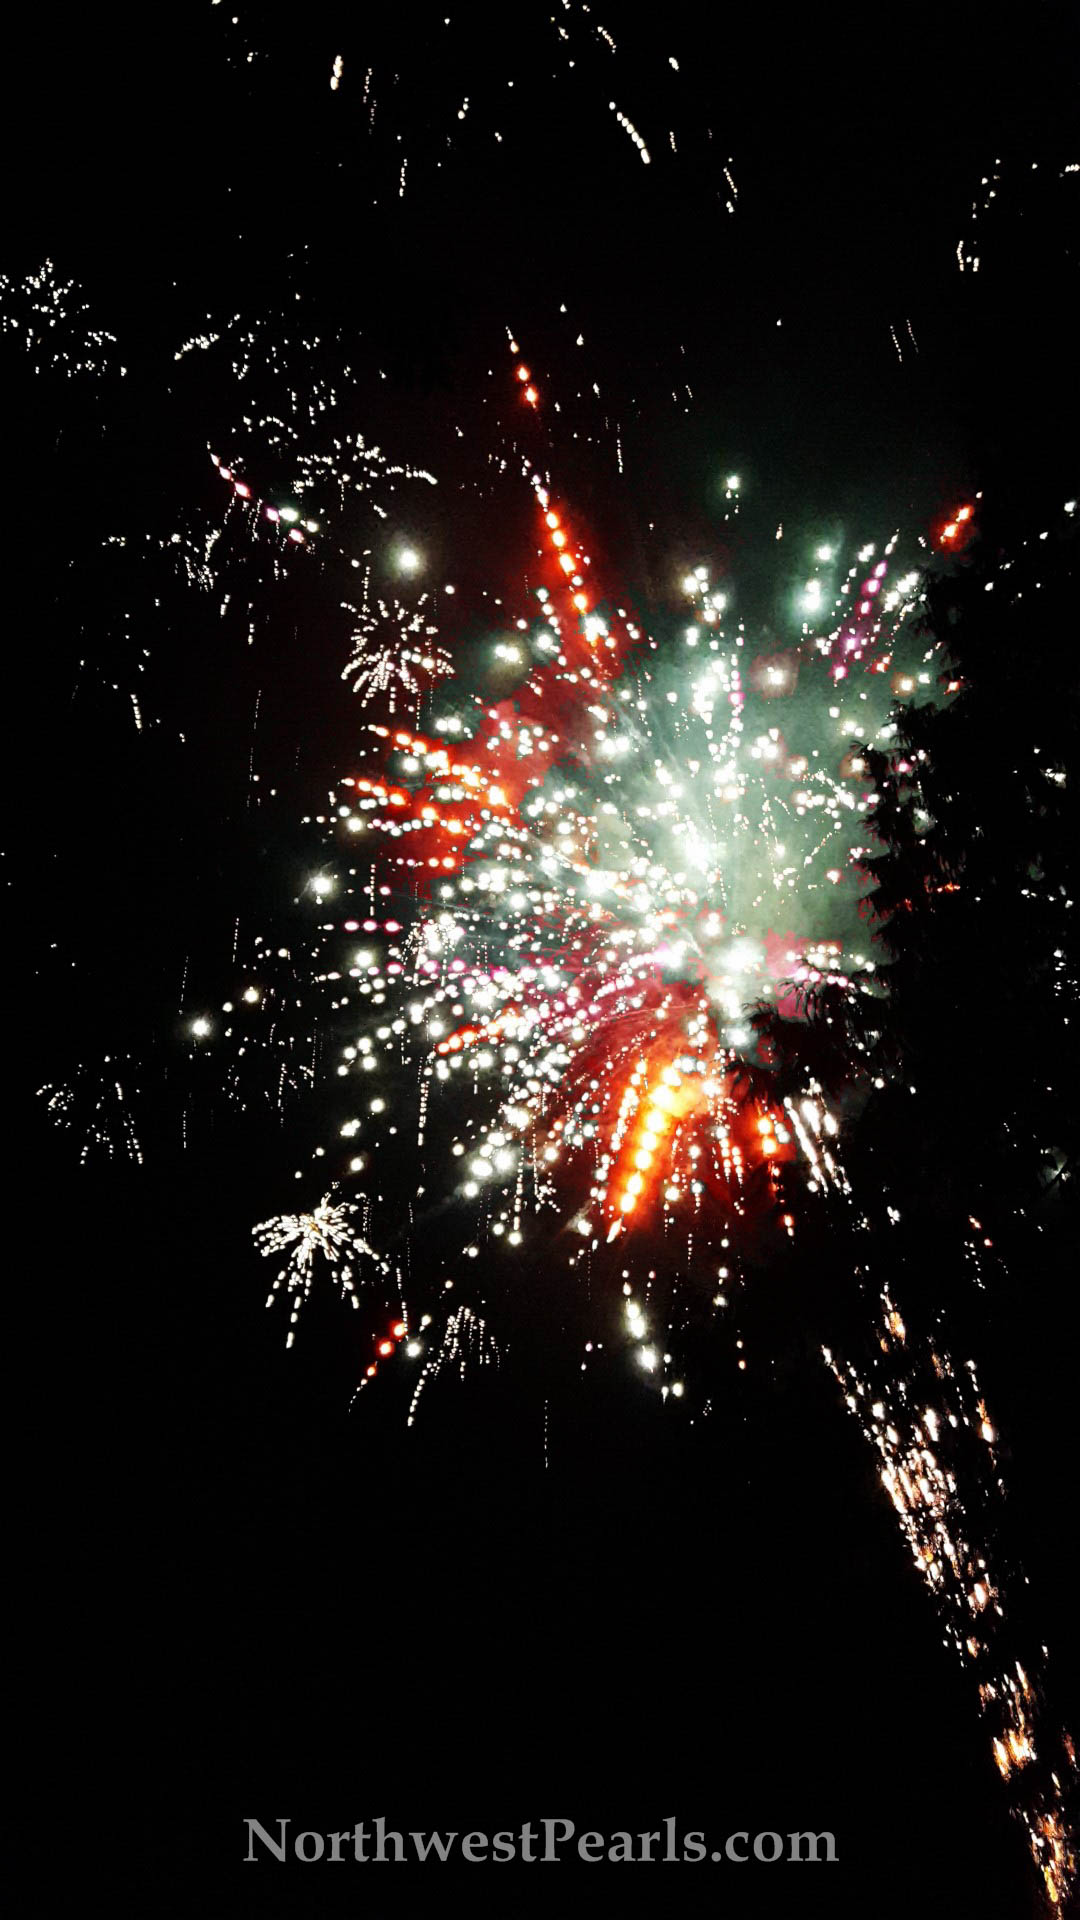 Northwest Pearls: Fireworks